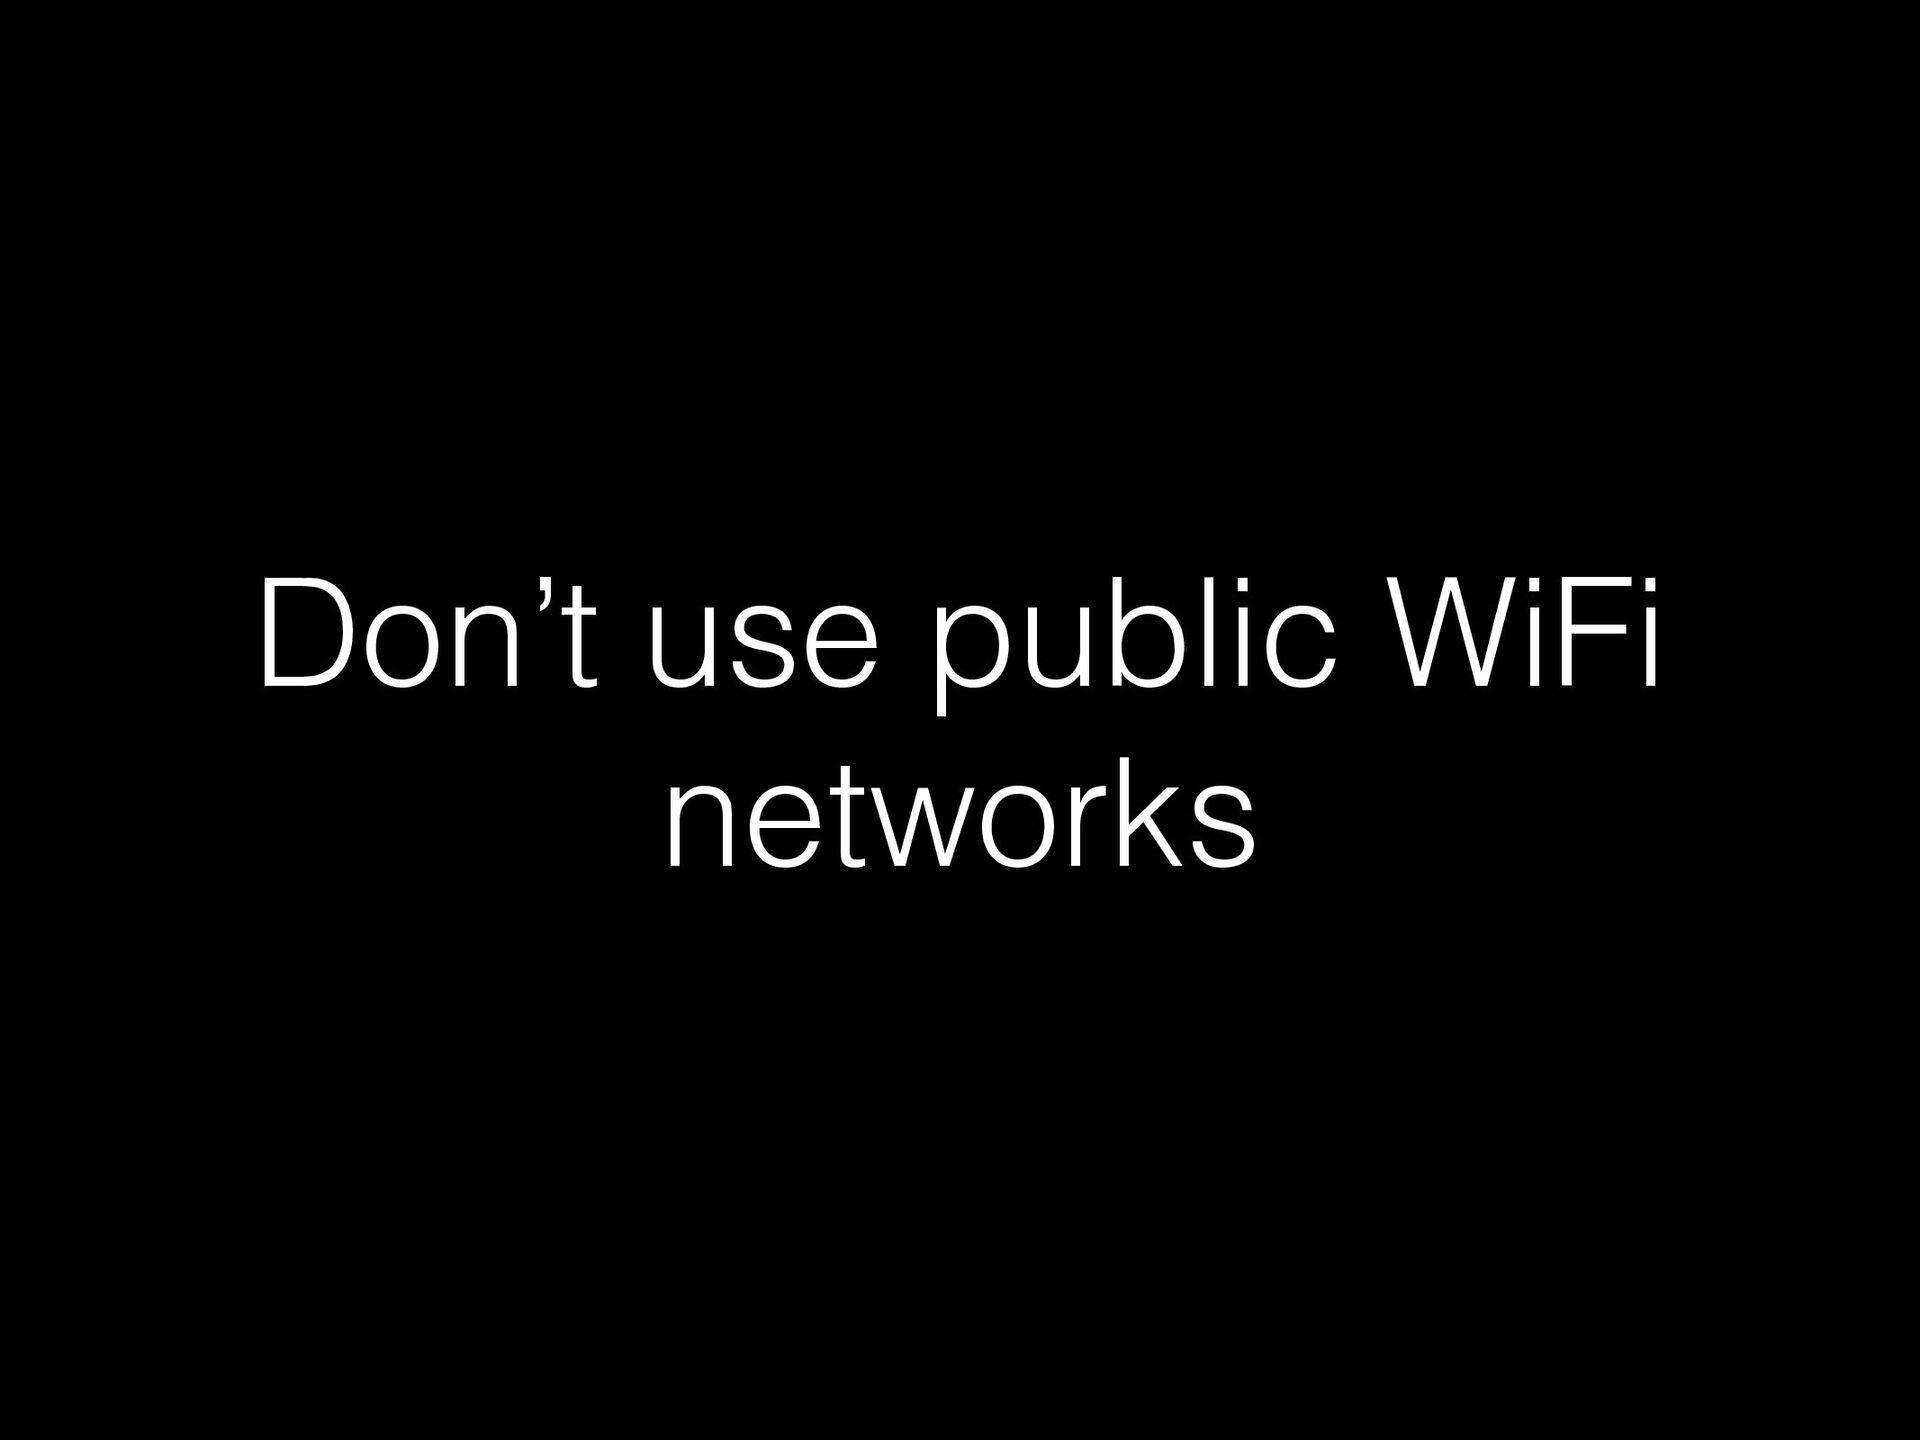 https://www.signal.org/